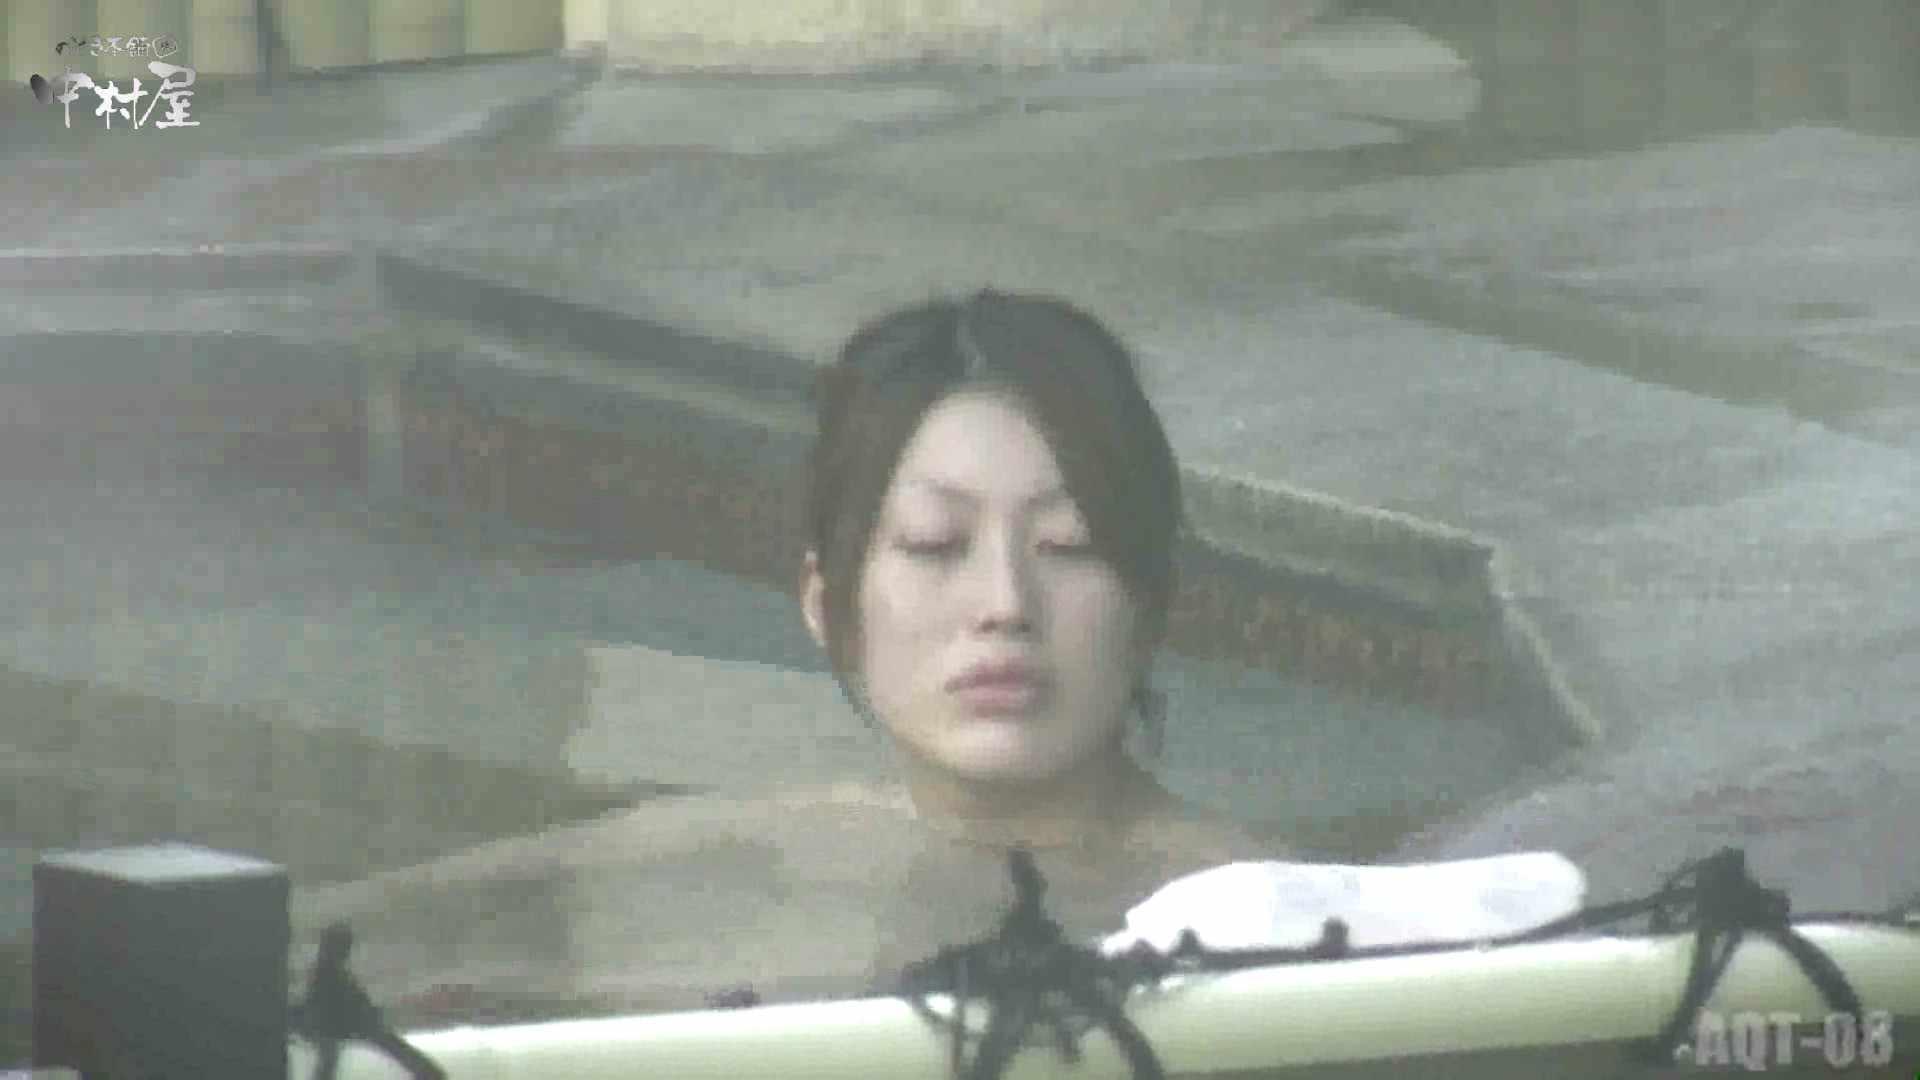 Aquaな露天風呂Vol.872潜入盗撮露天風呂八判湯 其の三 盗撮特集 | 潜入画像  96画像 71